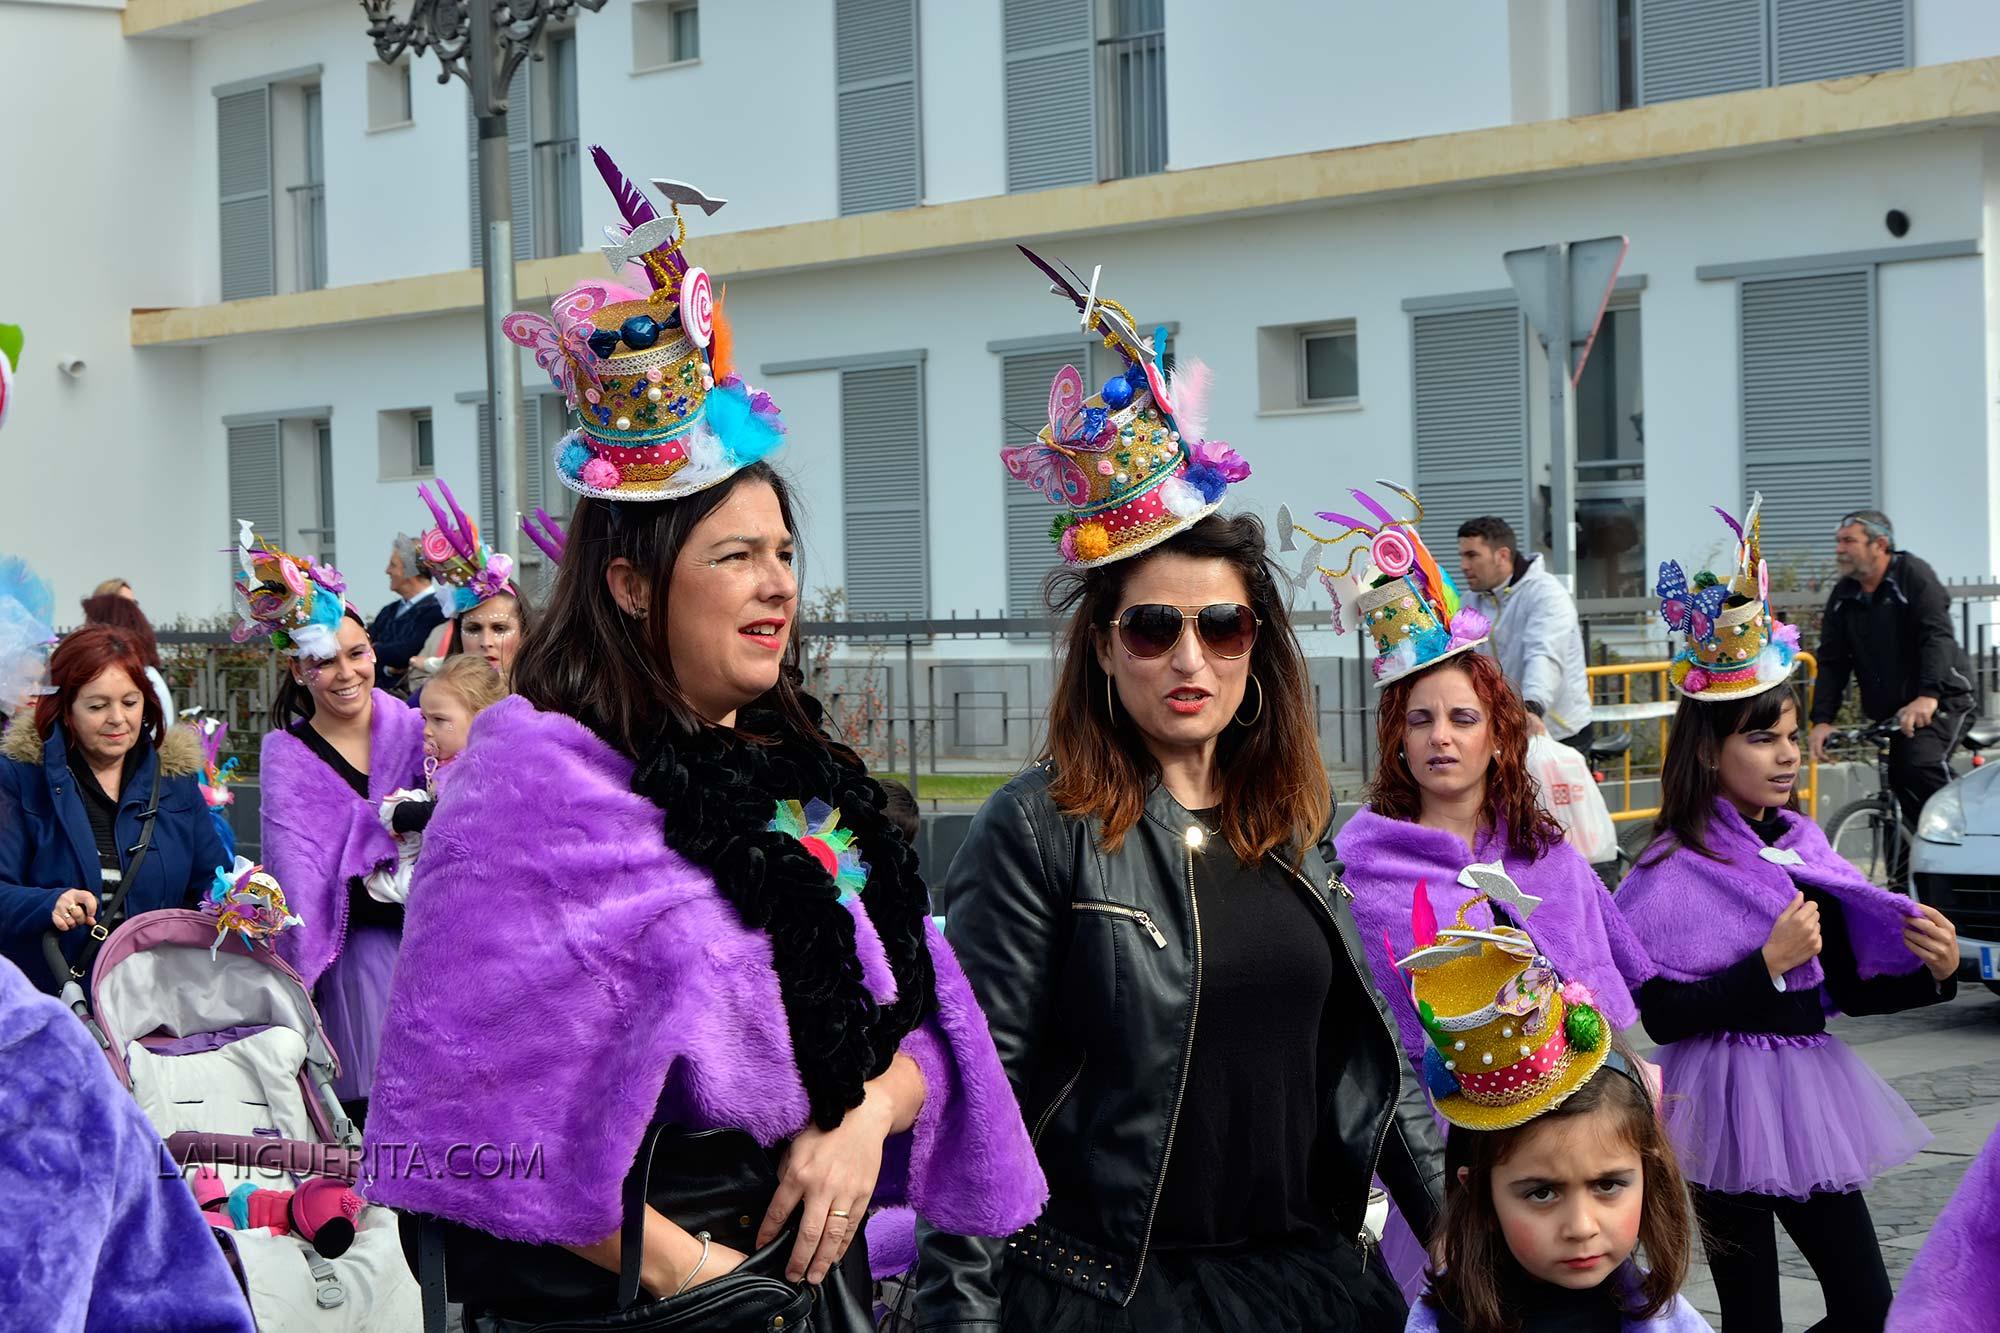 Cabalgata infantil de viudas carnaval de Isla cristina 2016 _DSC1914